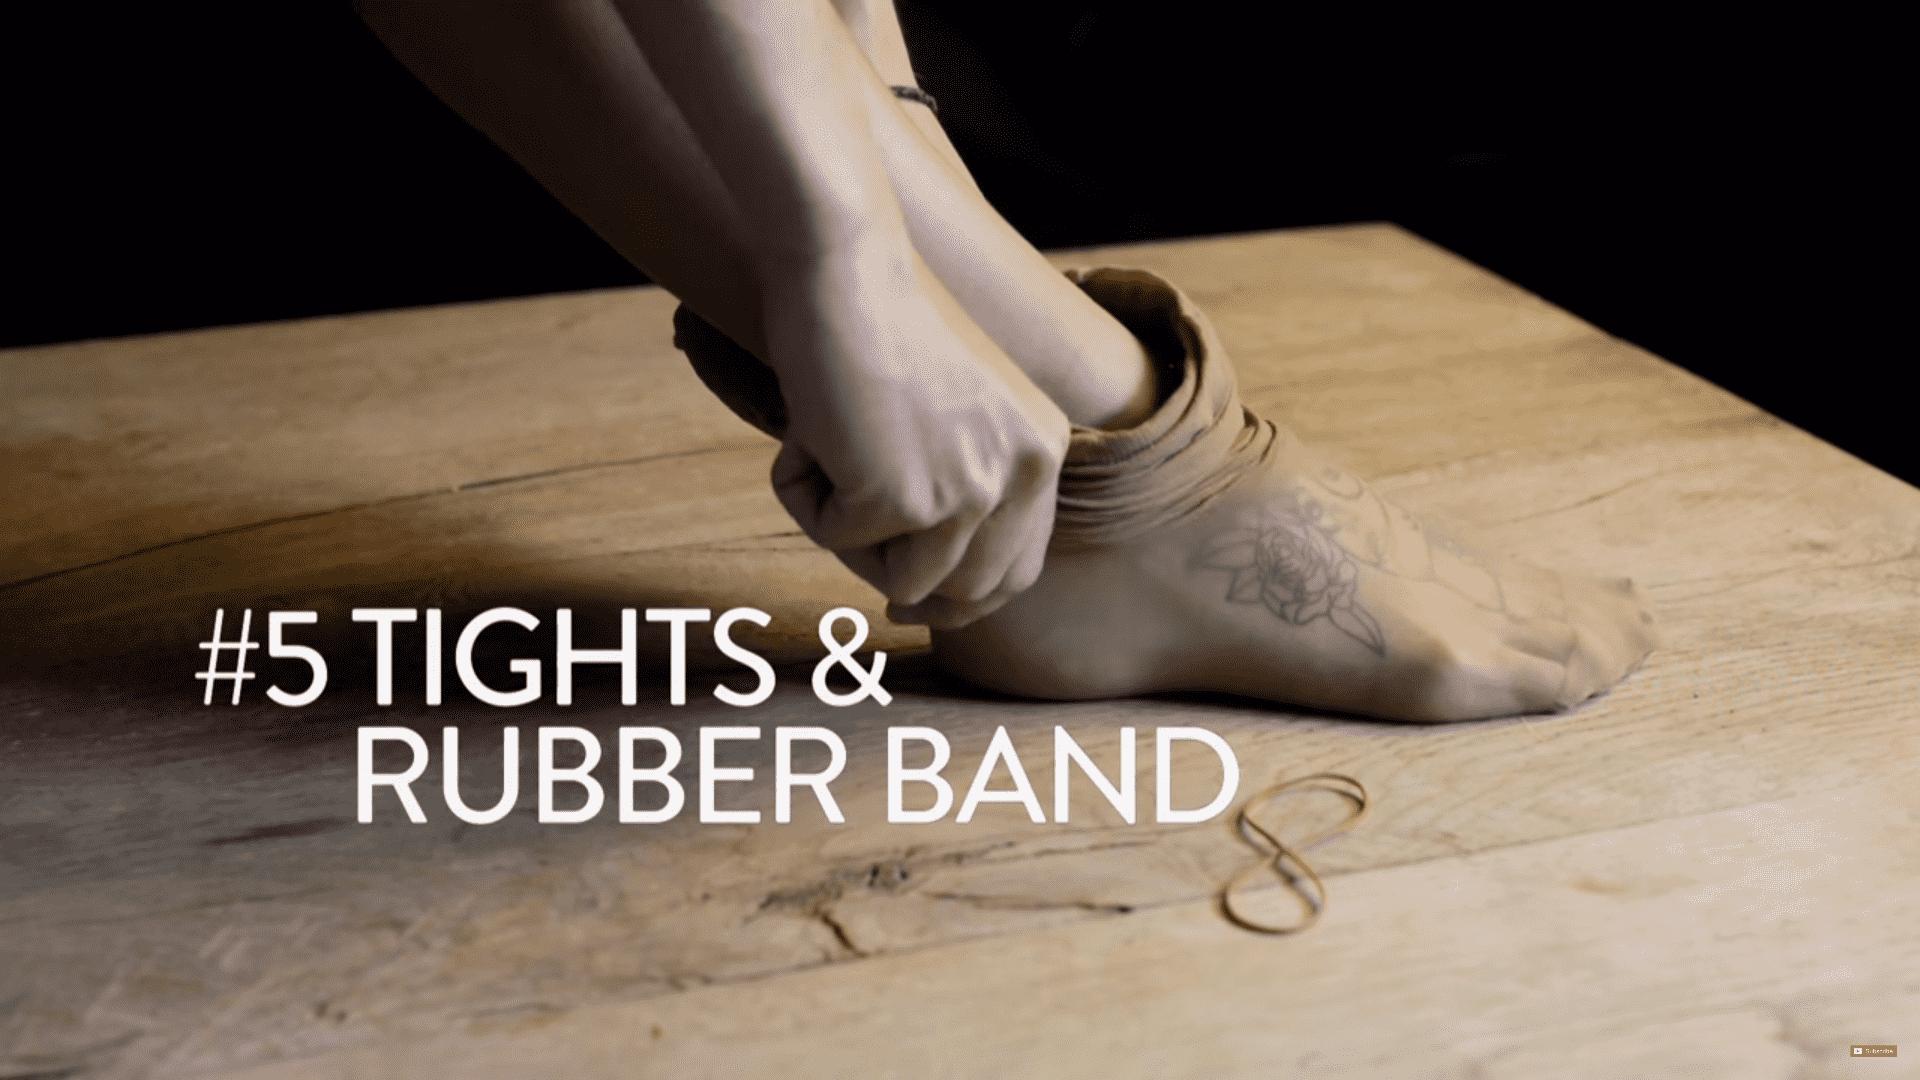 rubberbands1 min image